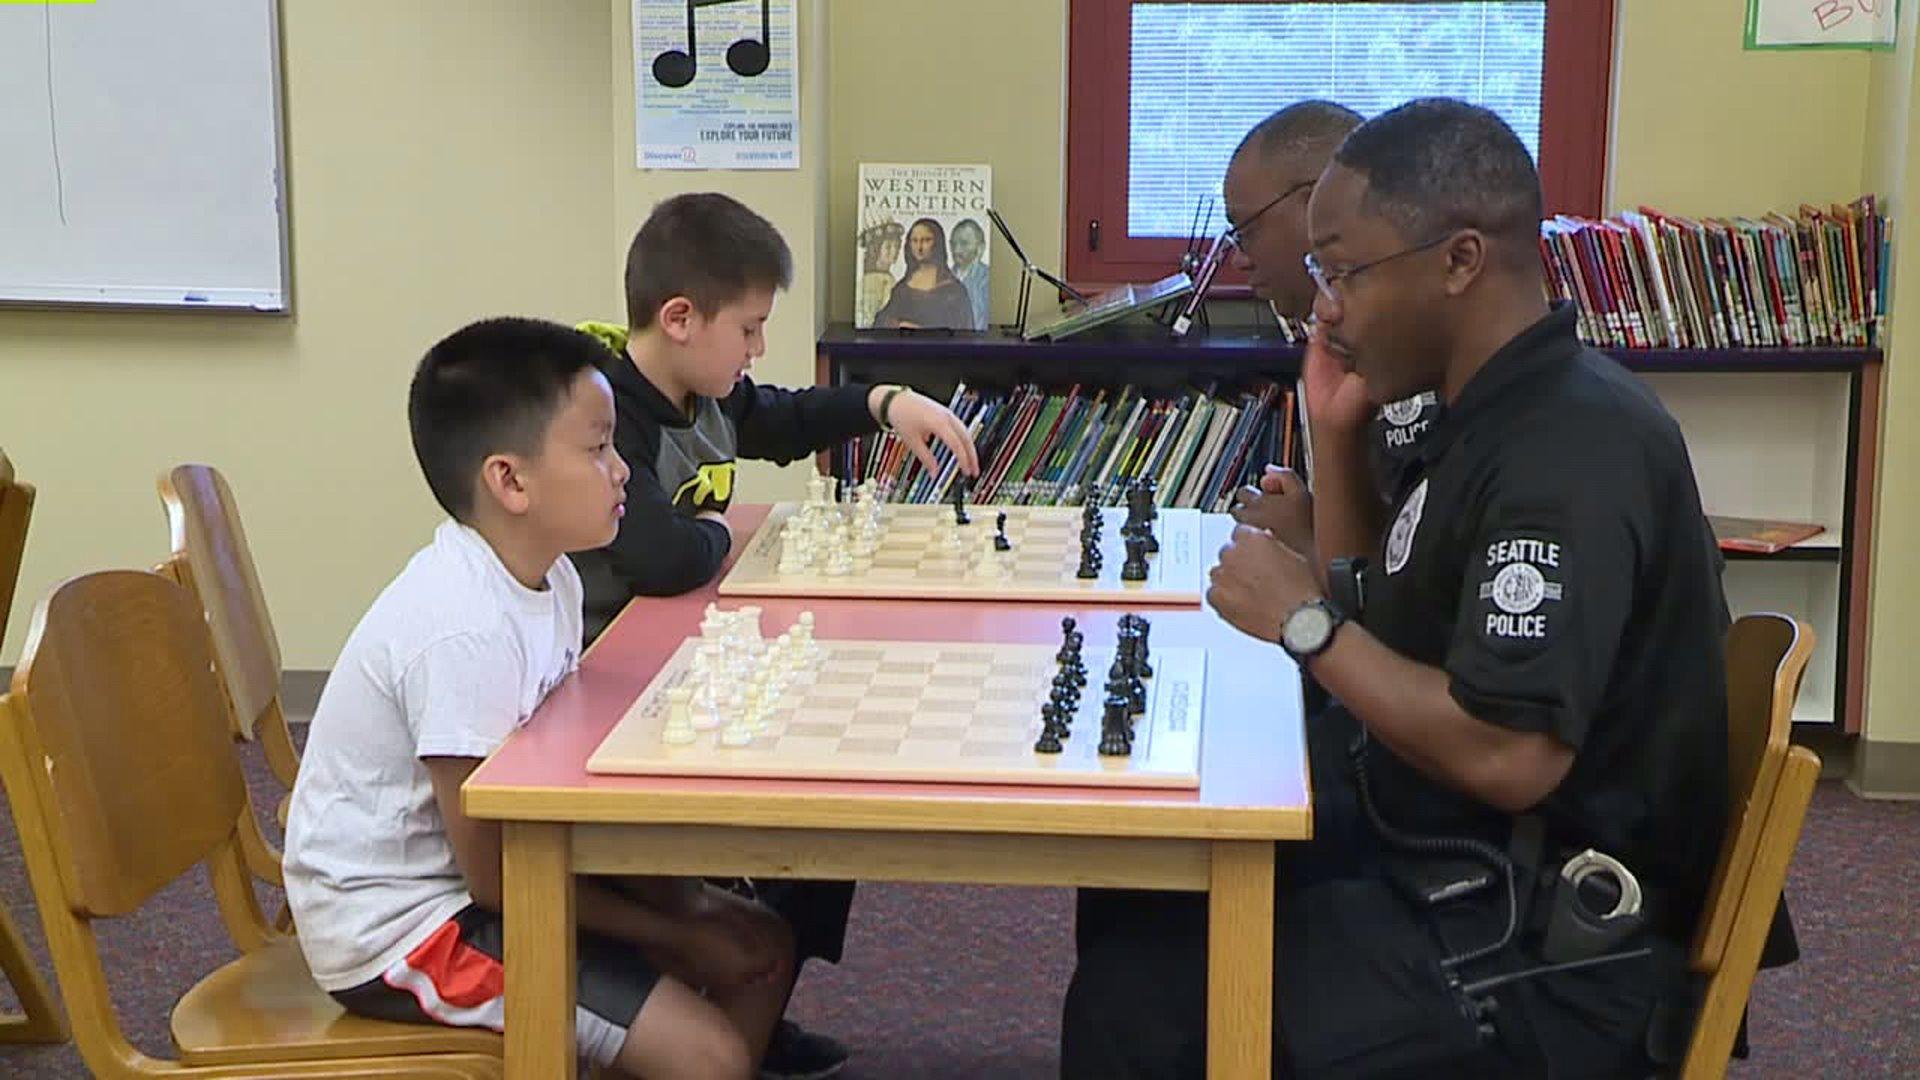 Cops vs. Kids Chess Tournament Held in Seattle